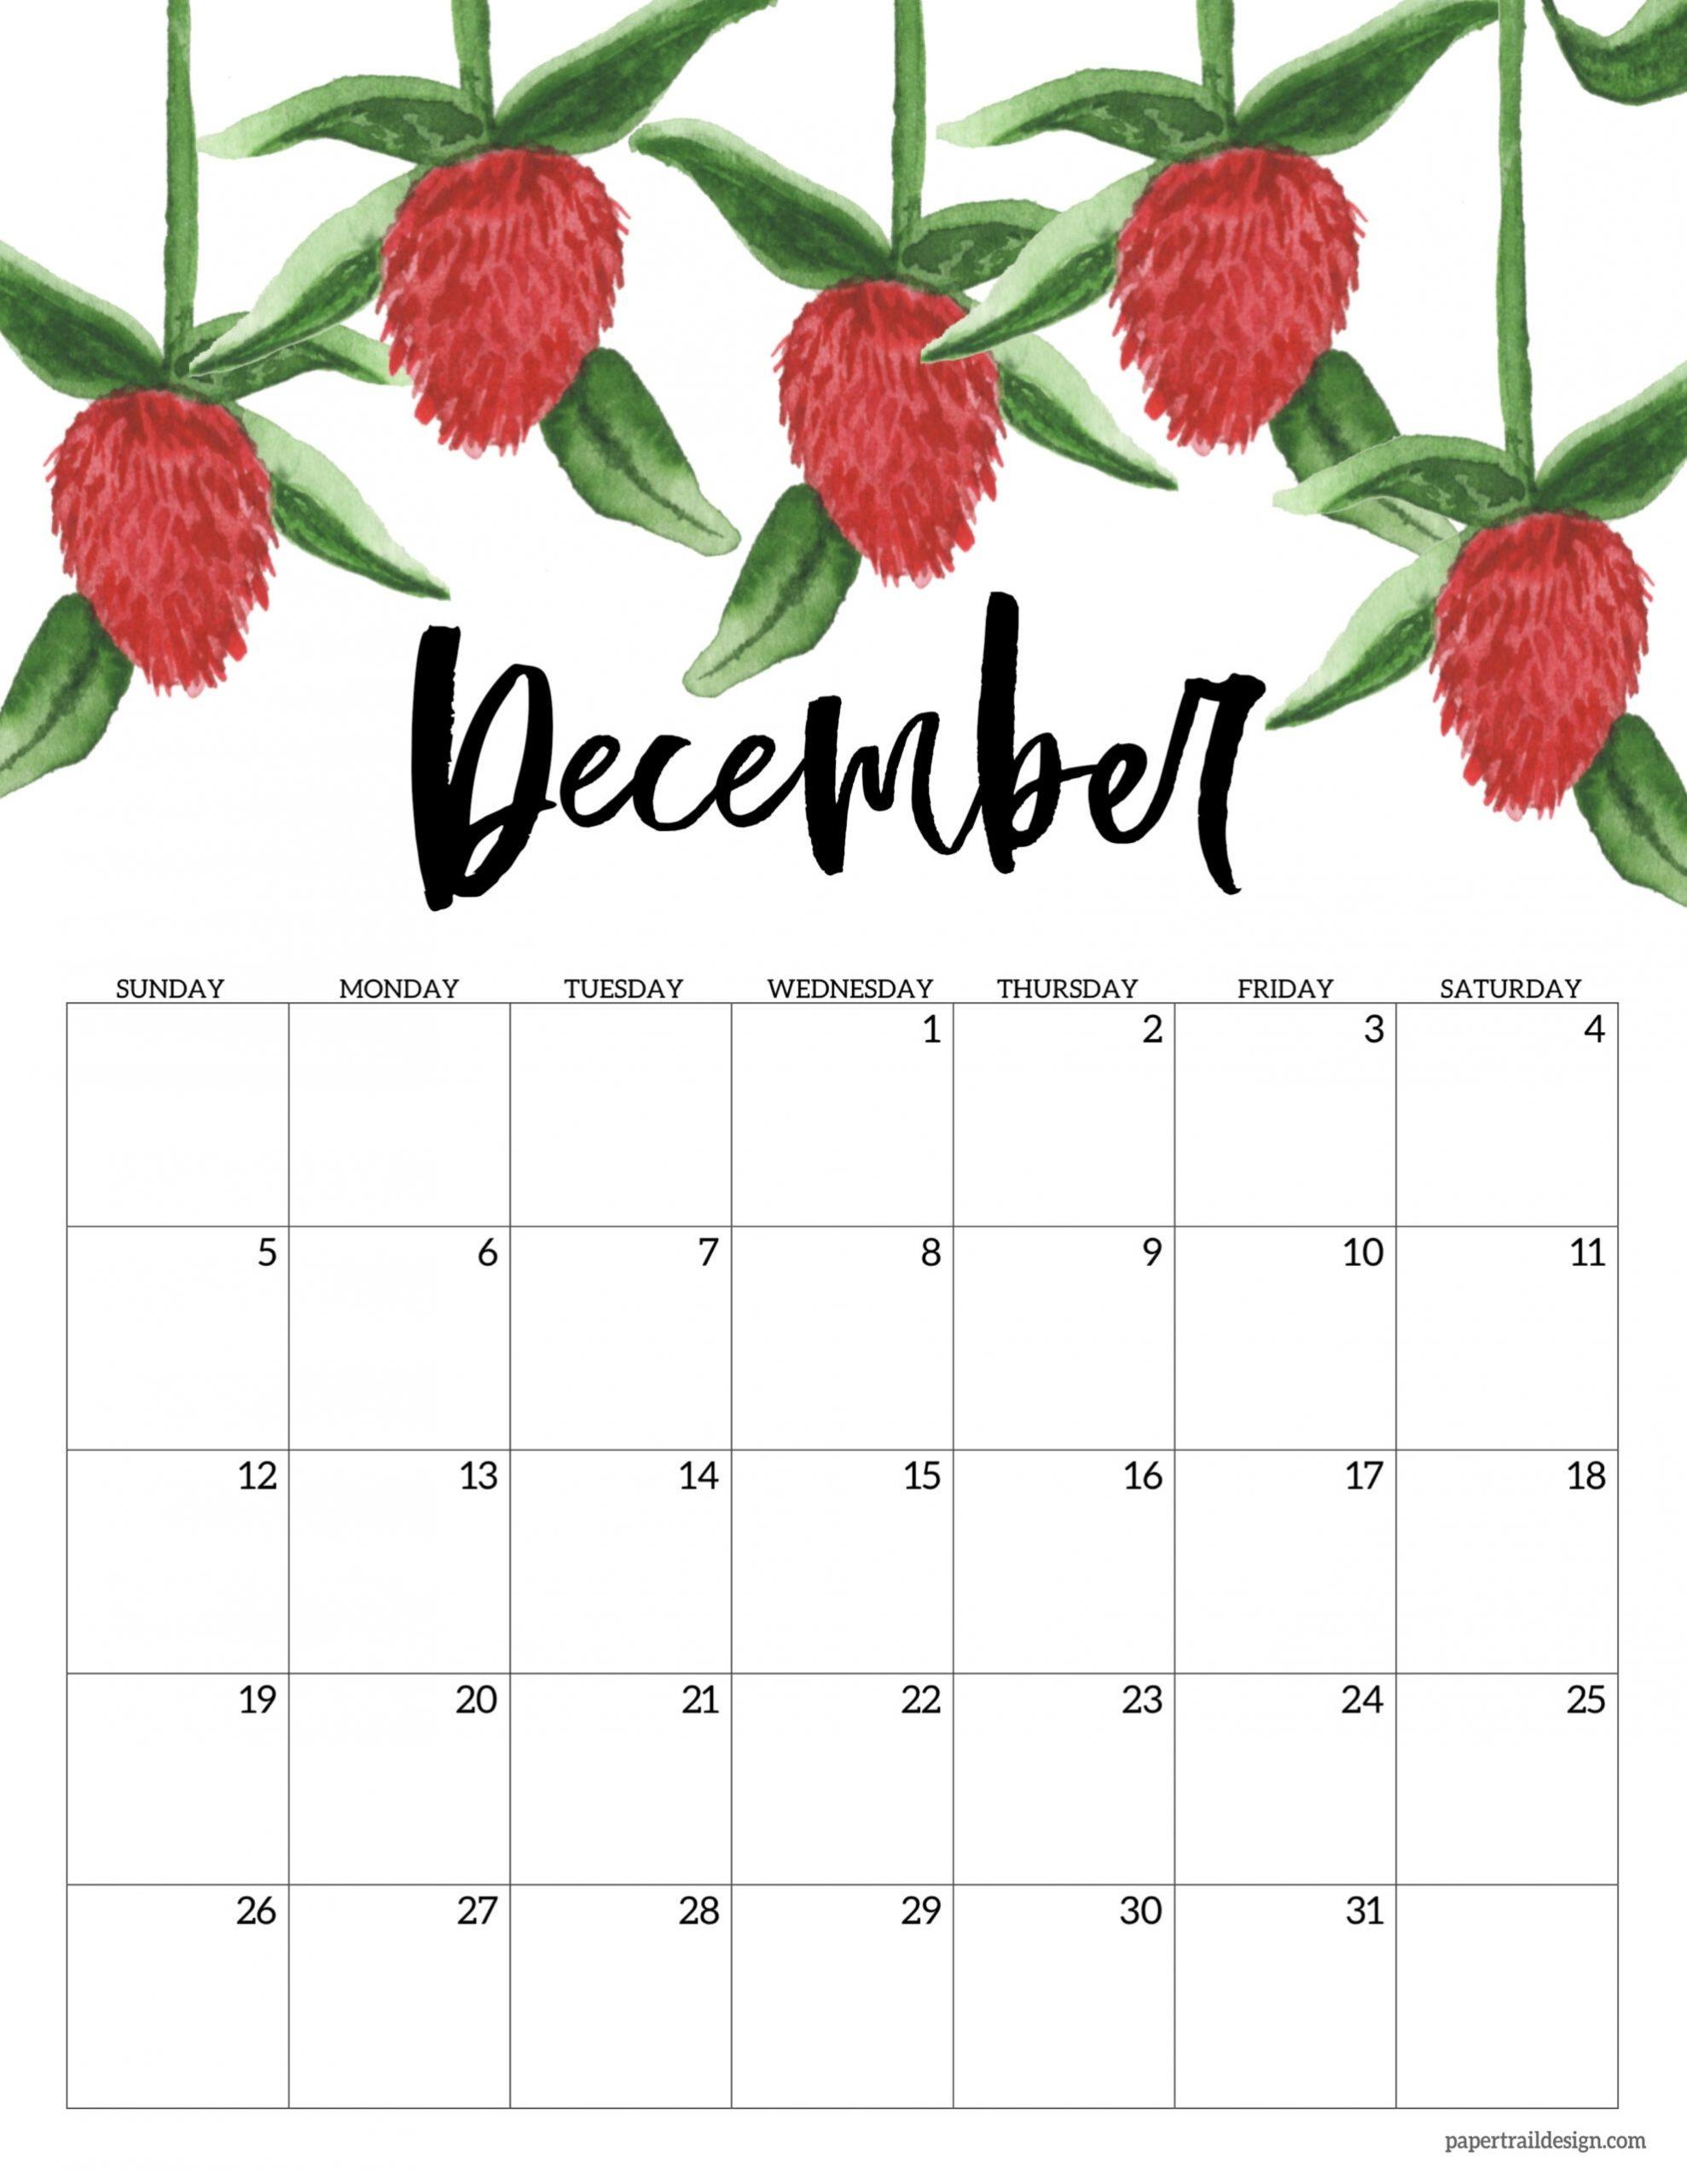 Get December Christmas Calendar Printable 2021